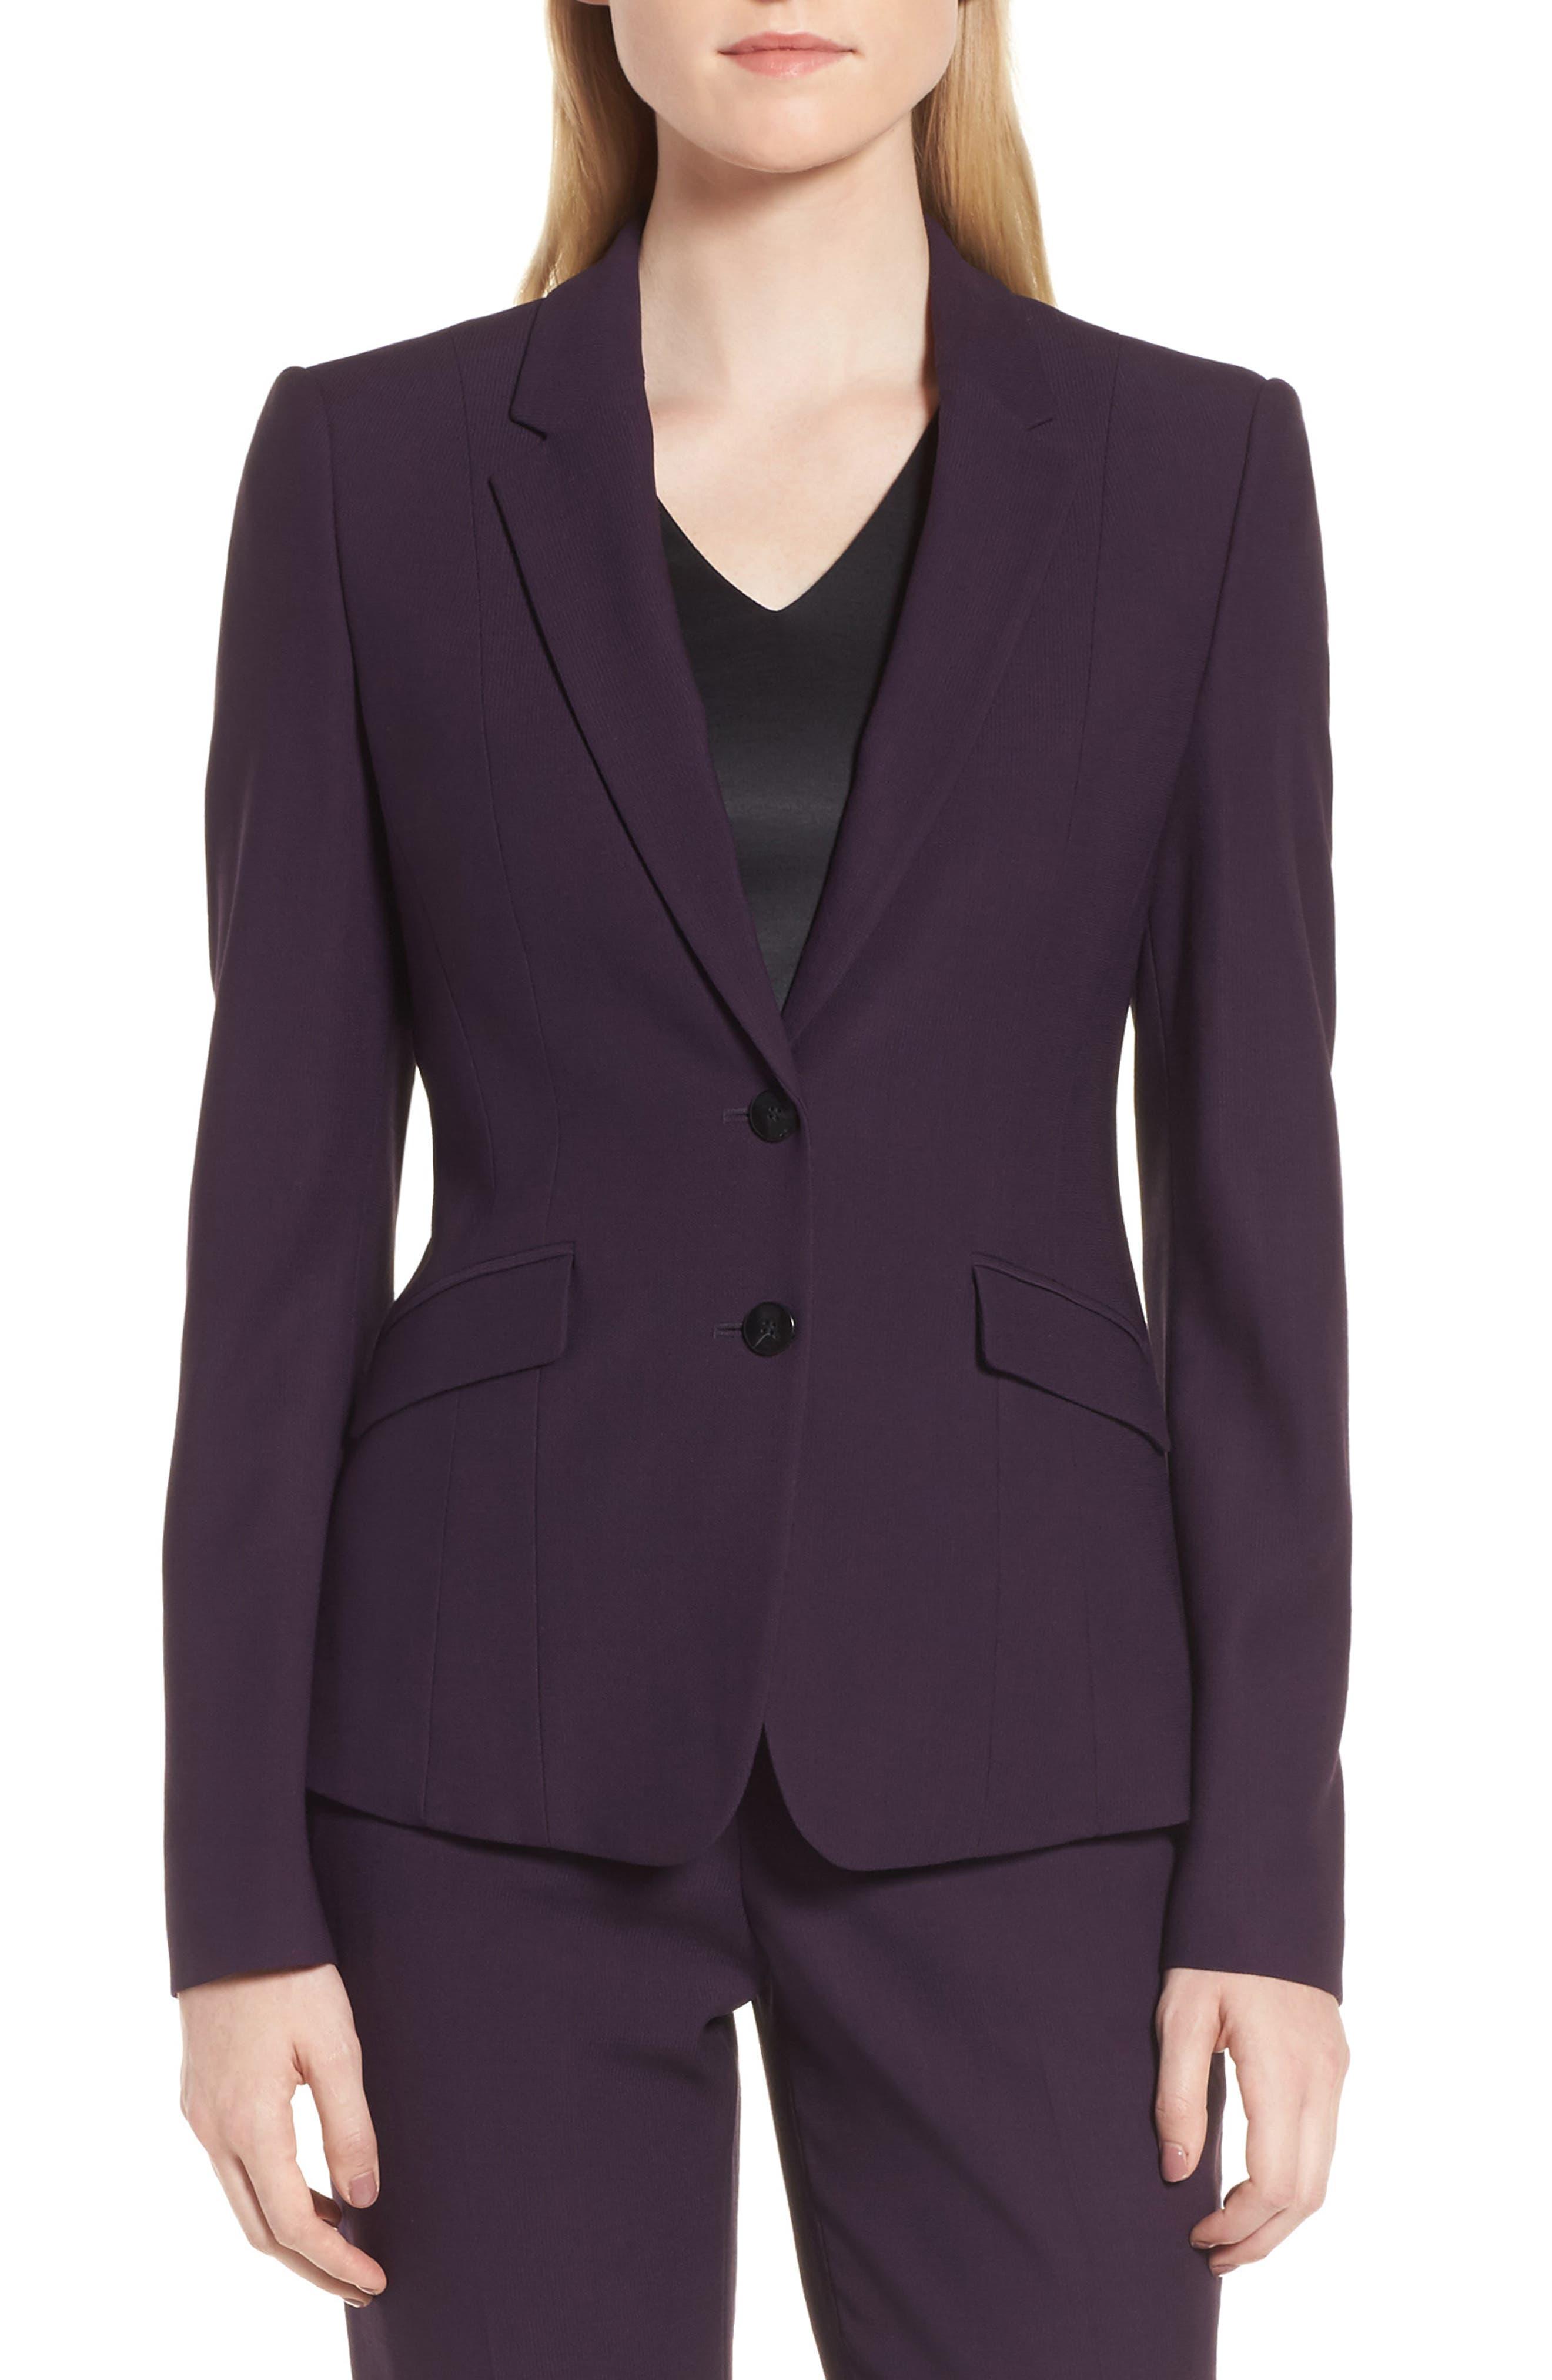 Alternate Image 1 Selected - BOSS Jonalua Stretch Wool Suit Jacket (Regular & Petite)